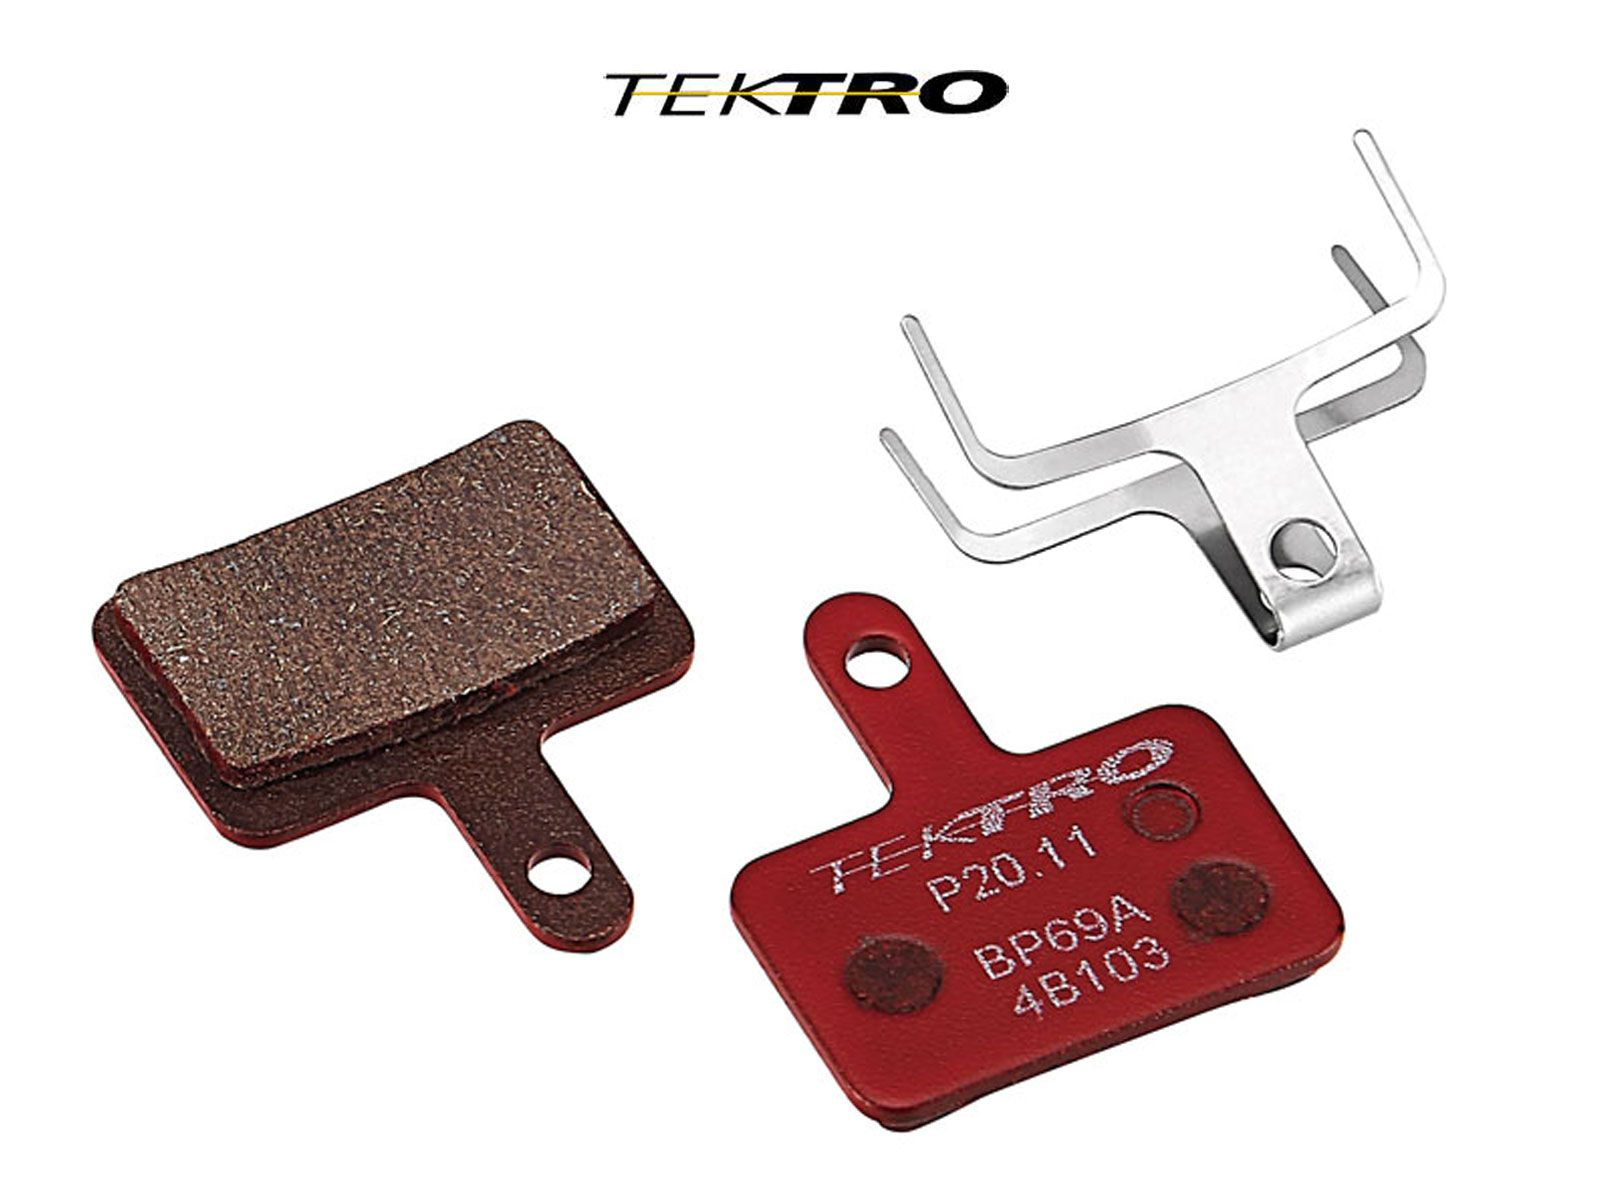 TEKTRO Brzdové destičky TK-P20.11 - Orion (2ks) (červená)